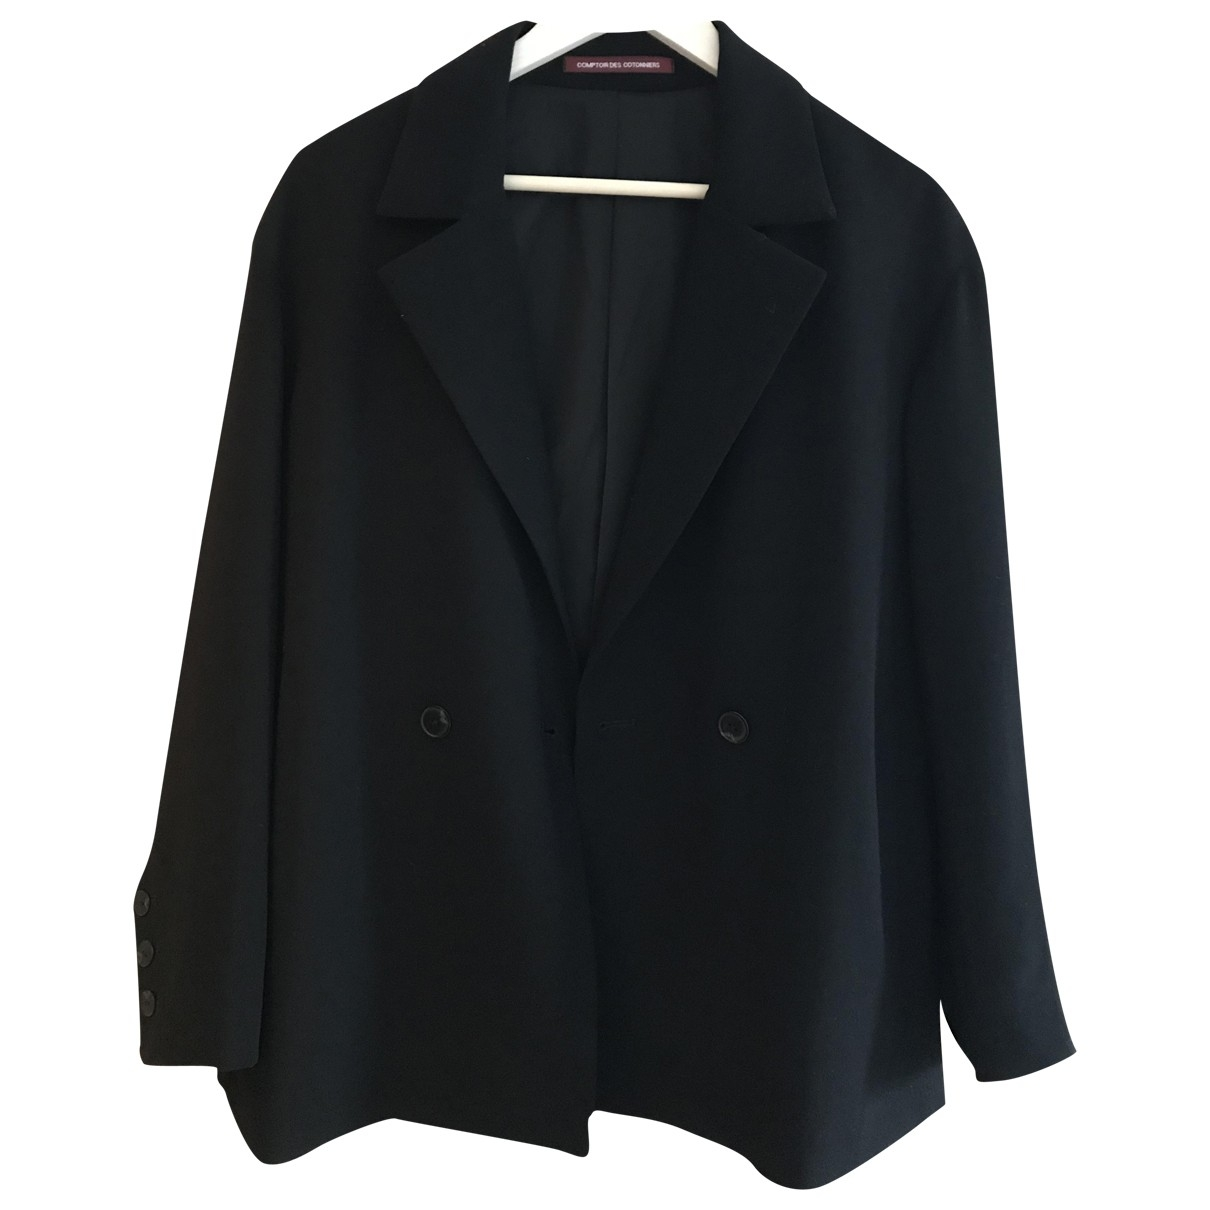 Comptoir Des Cotonniers \N Jacke in  Schwarz Polyester